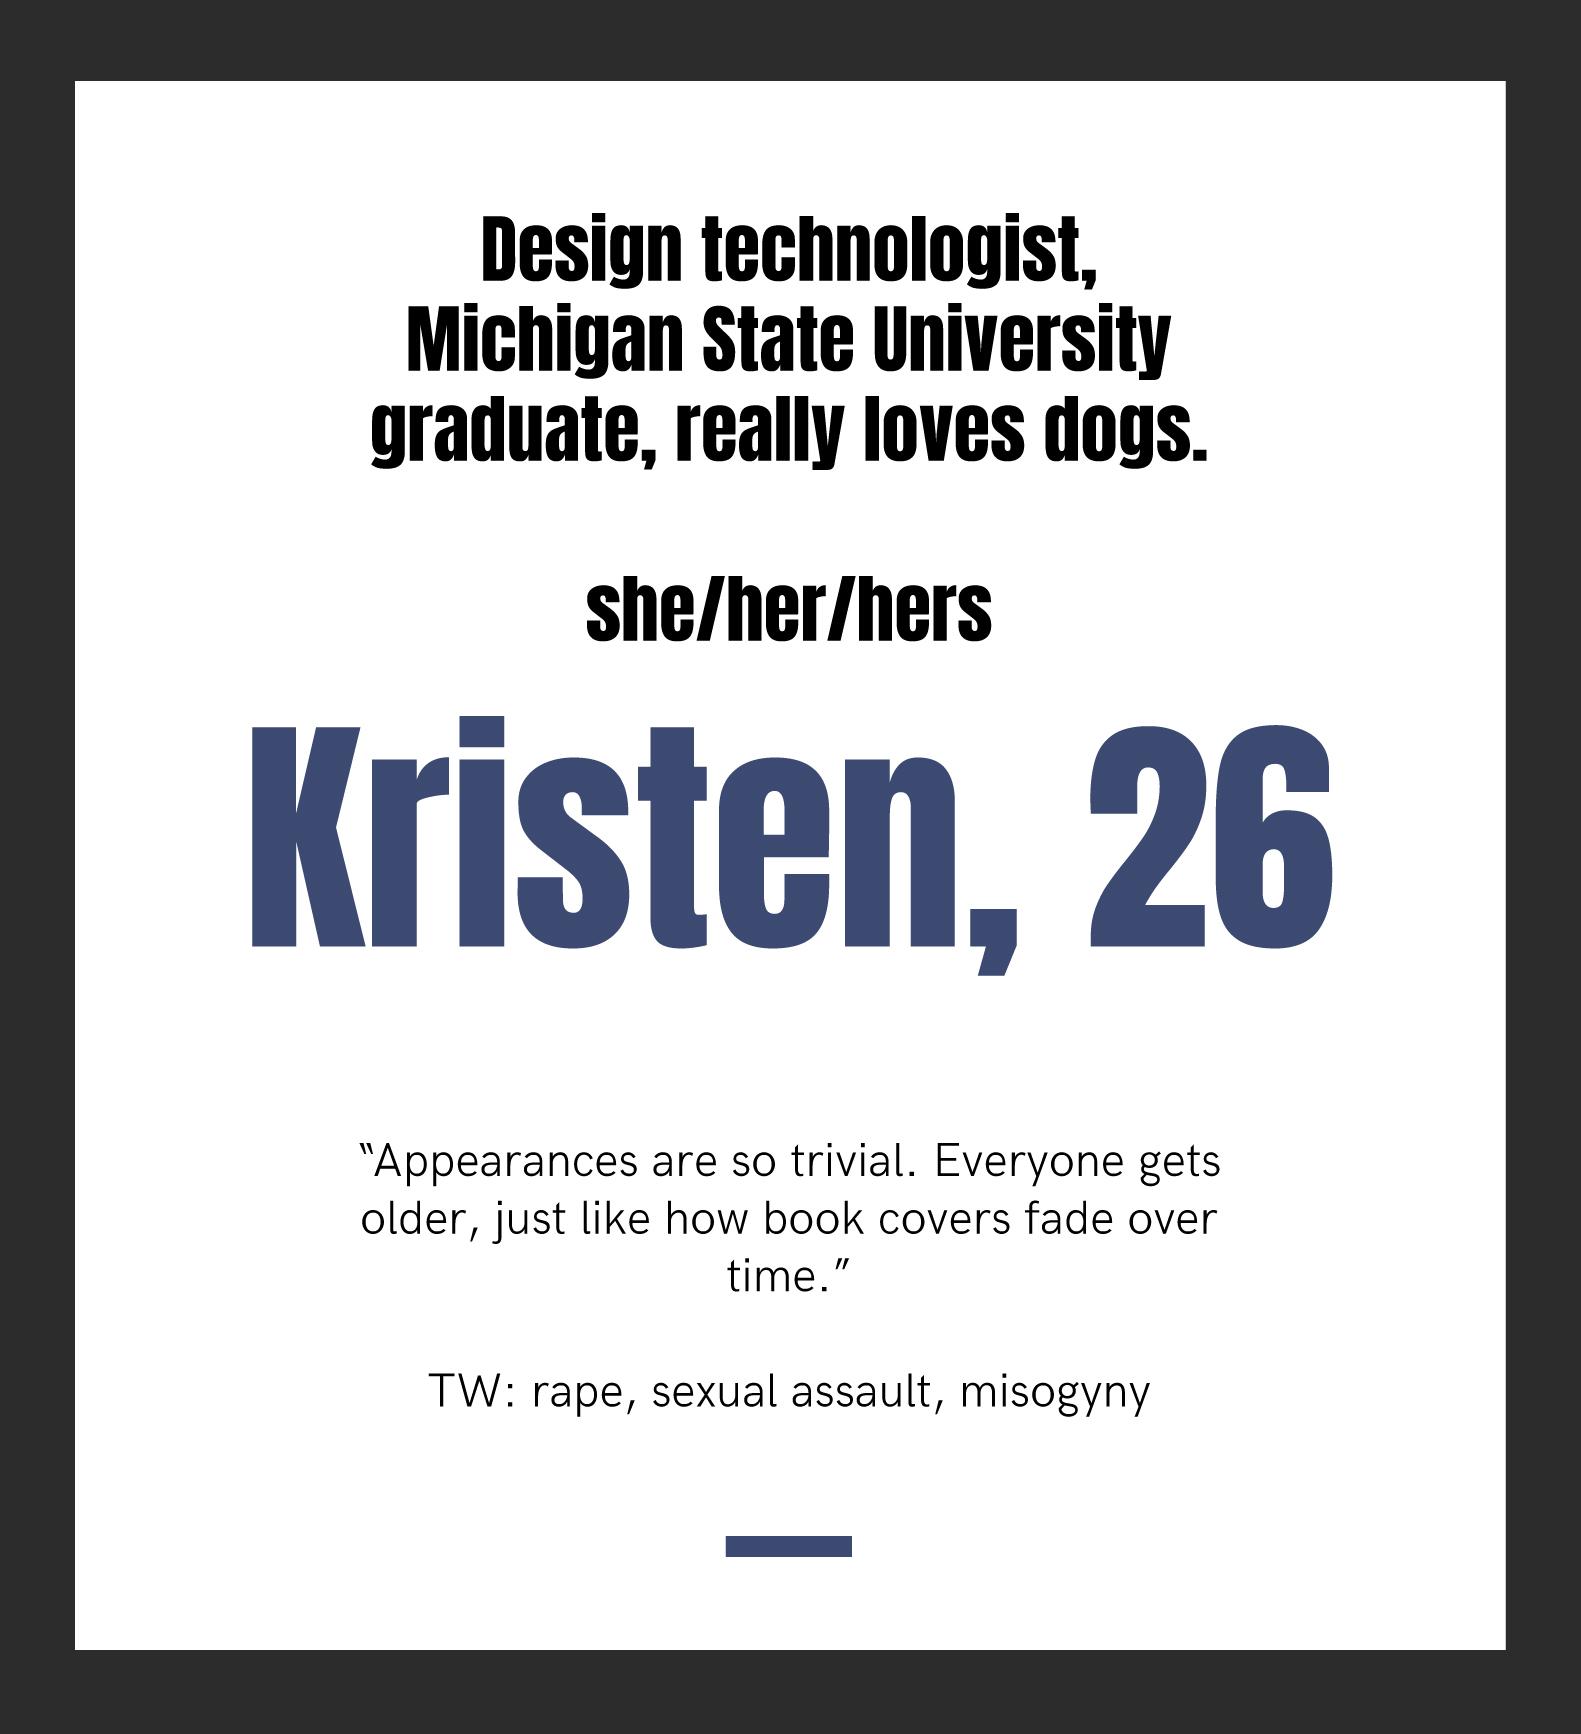 Kristen, 26